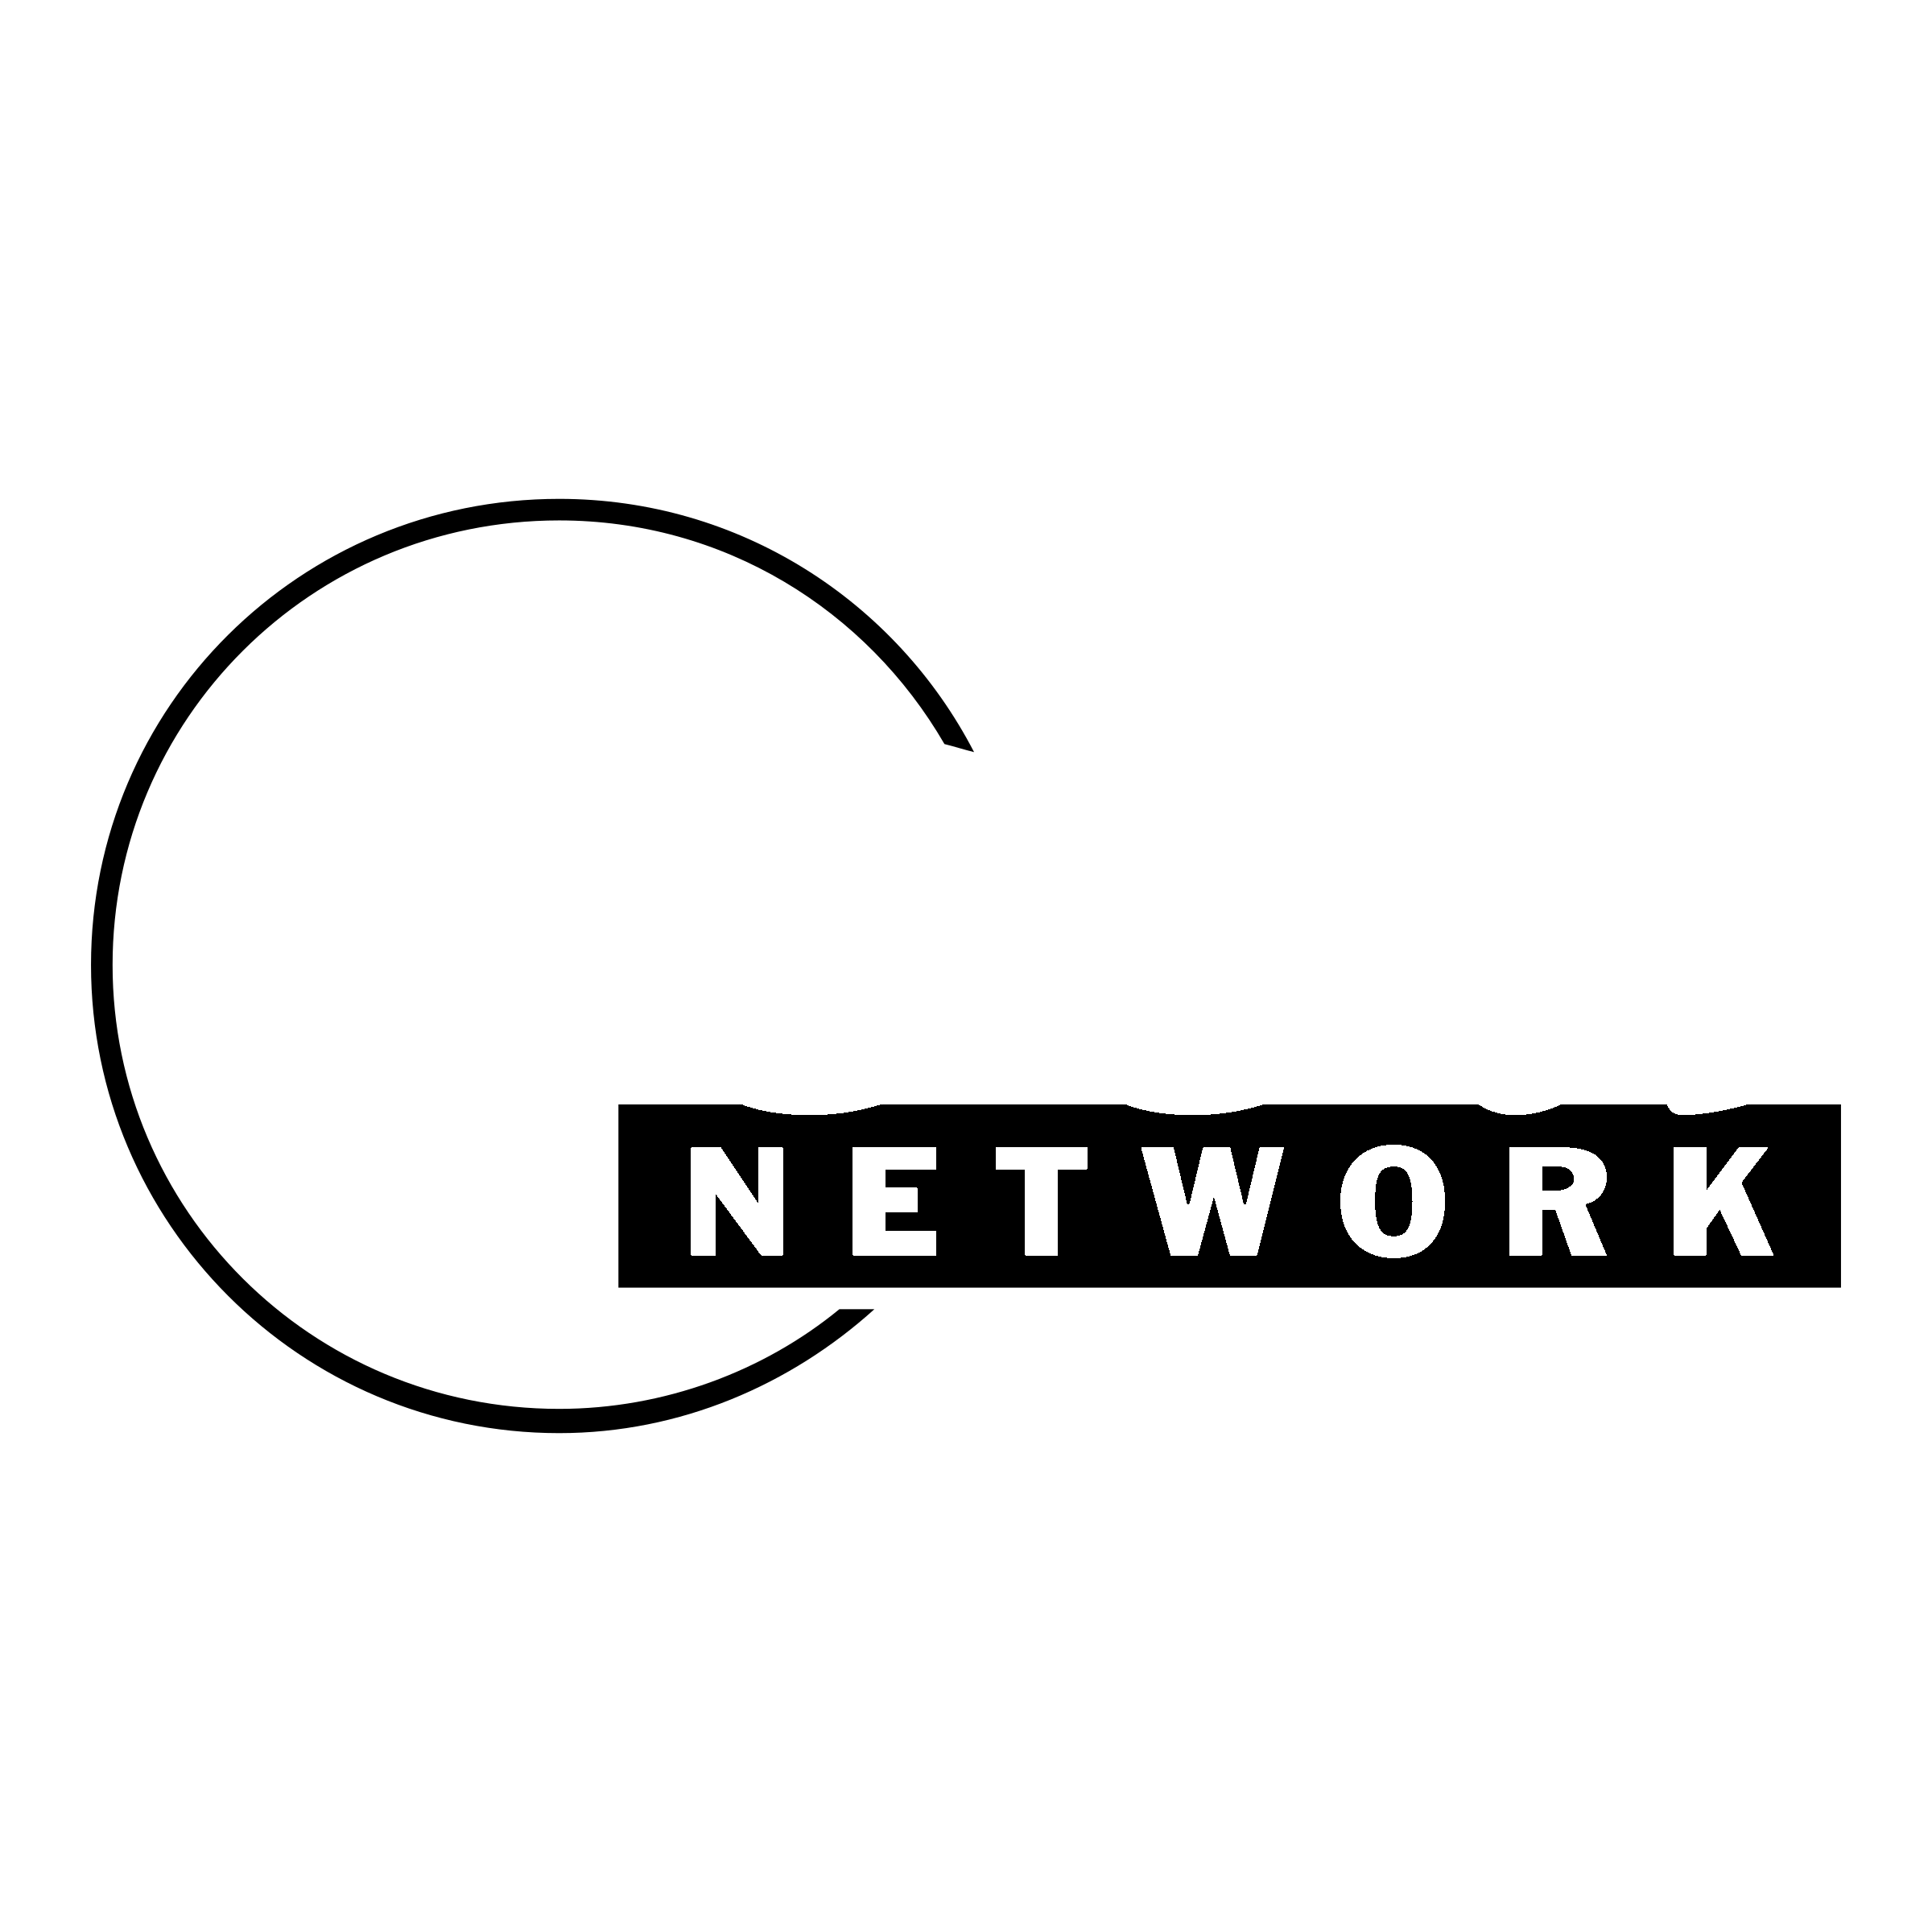 Food Network Logo Png Transparent Svg Vector Freebie Supply